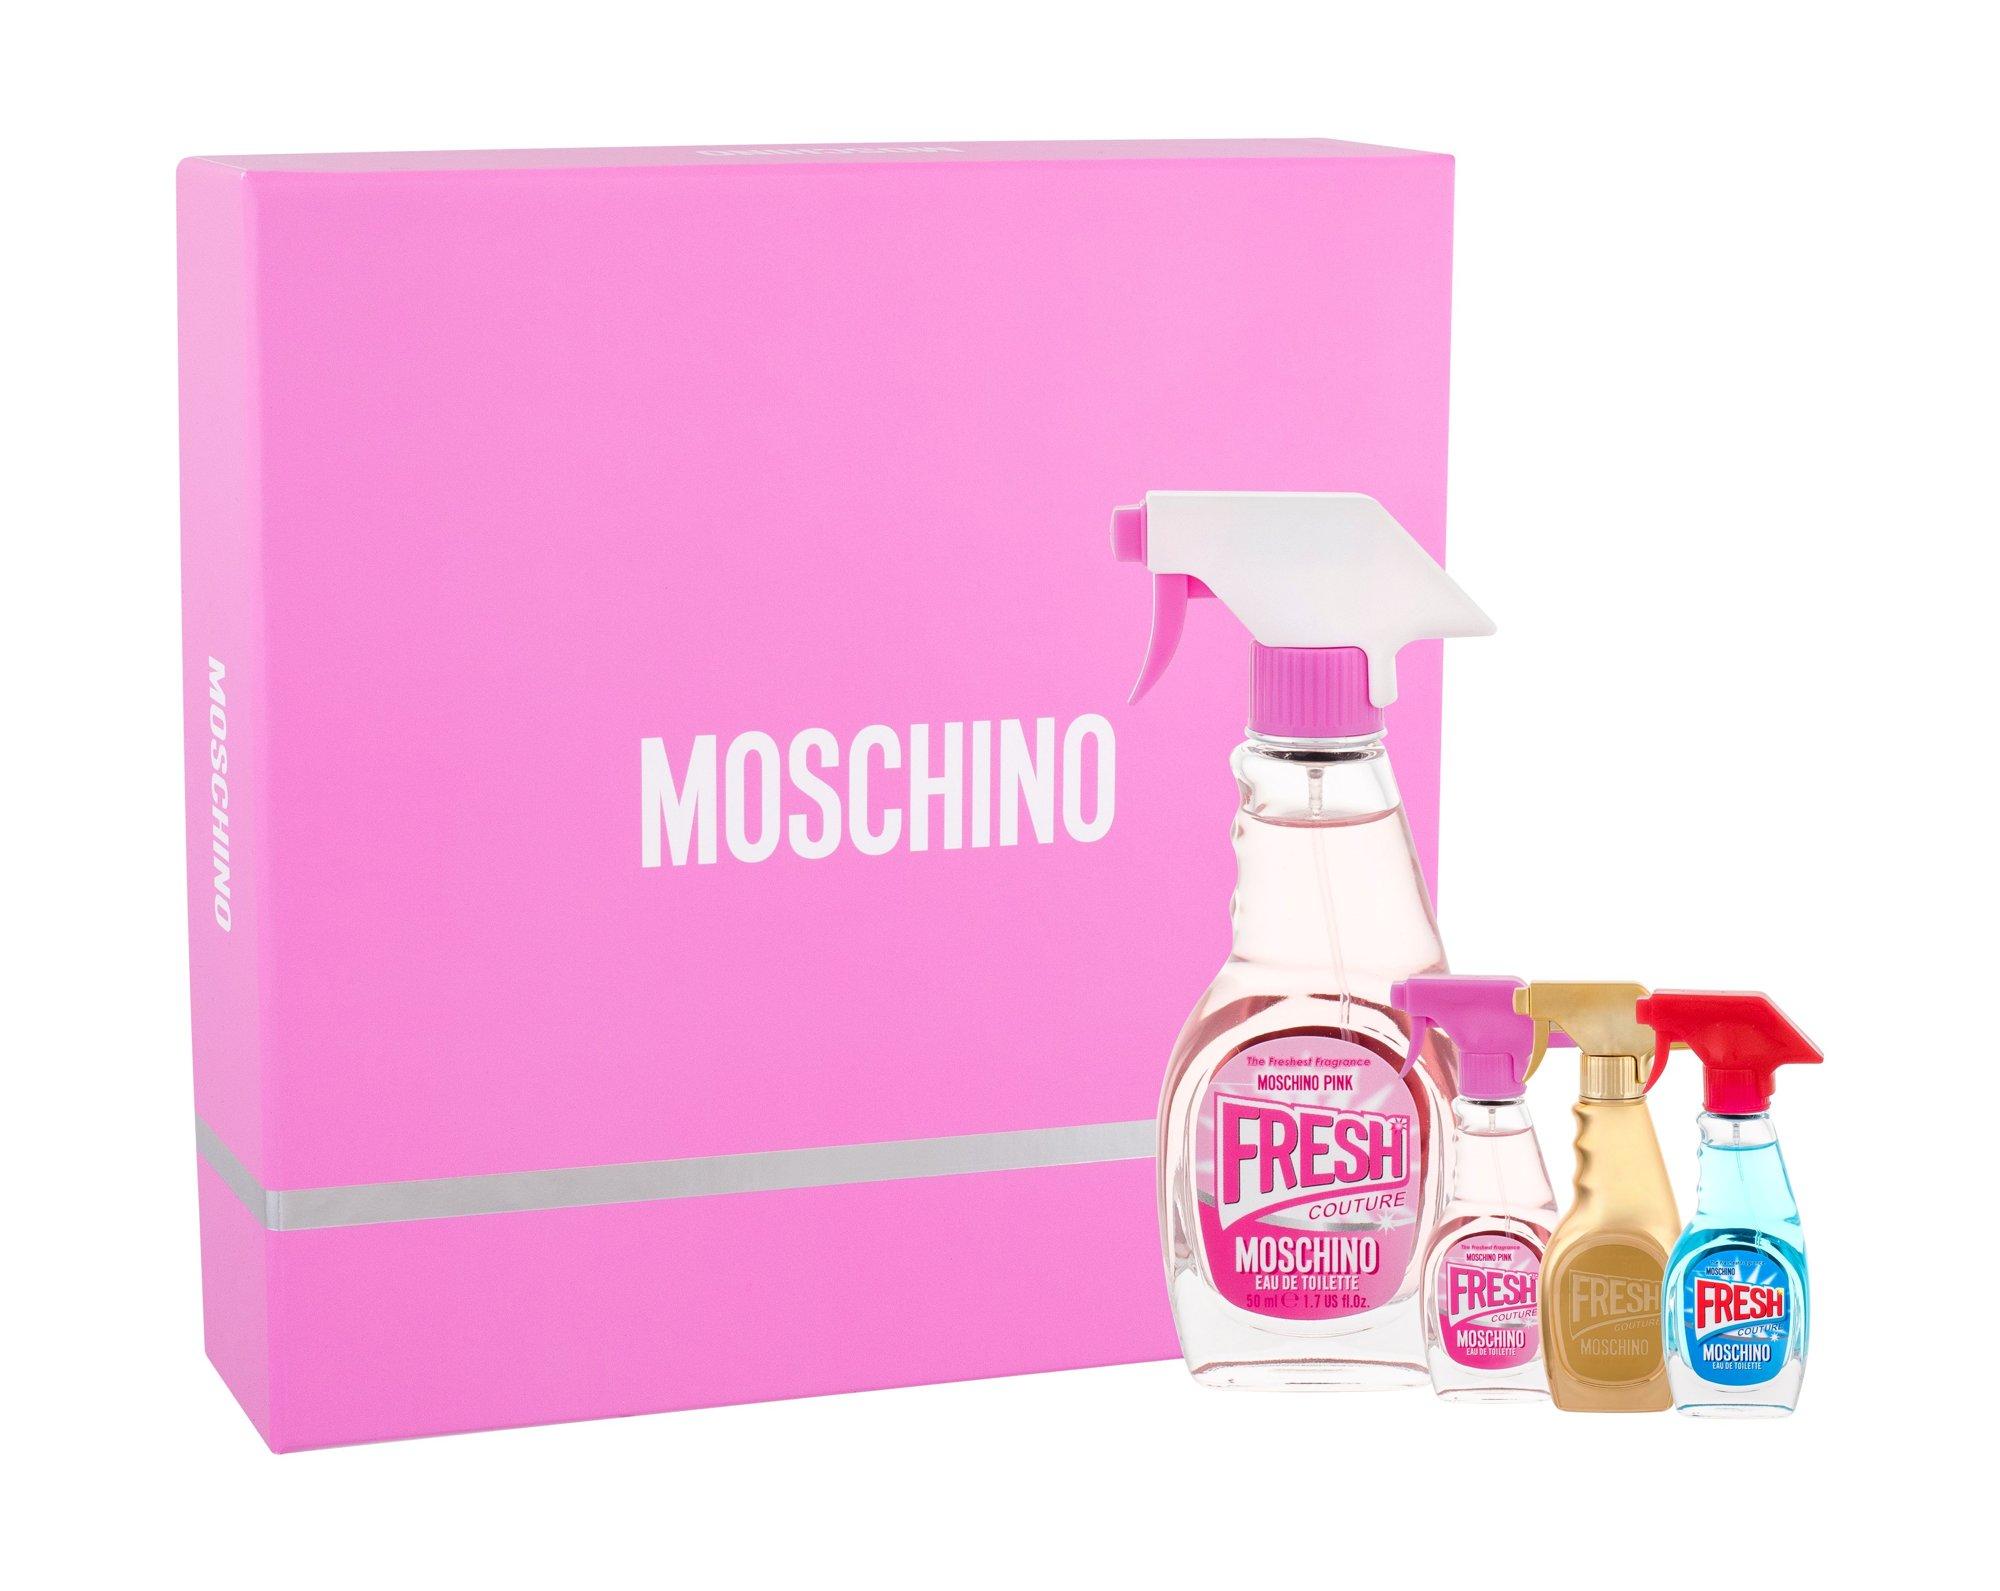 Moschino Fresh Couture Pink, Toaletní voda 50 ml+ Toaletní voda 5 ml + Toaletní voda Fresh Couture 5 ml + parfumovaná voda Fresh Couture Gold 5 ml